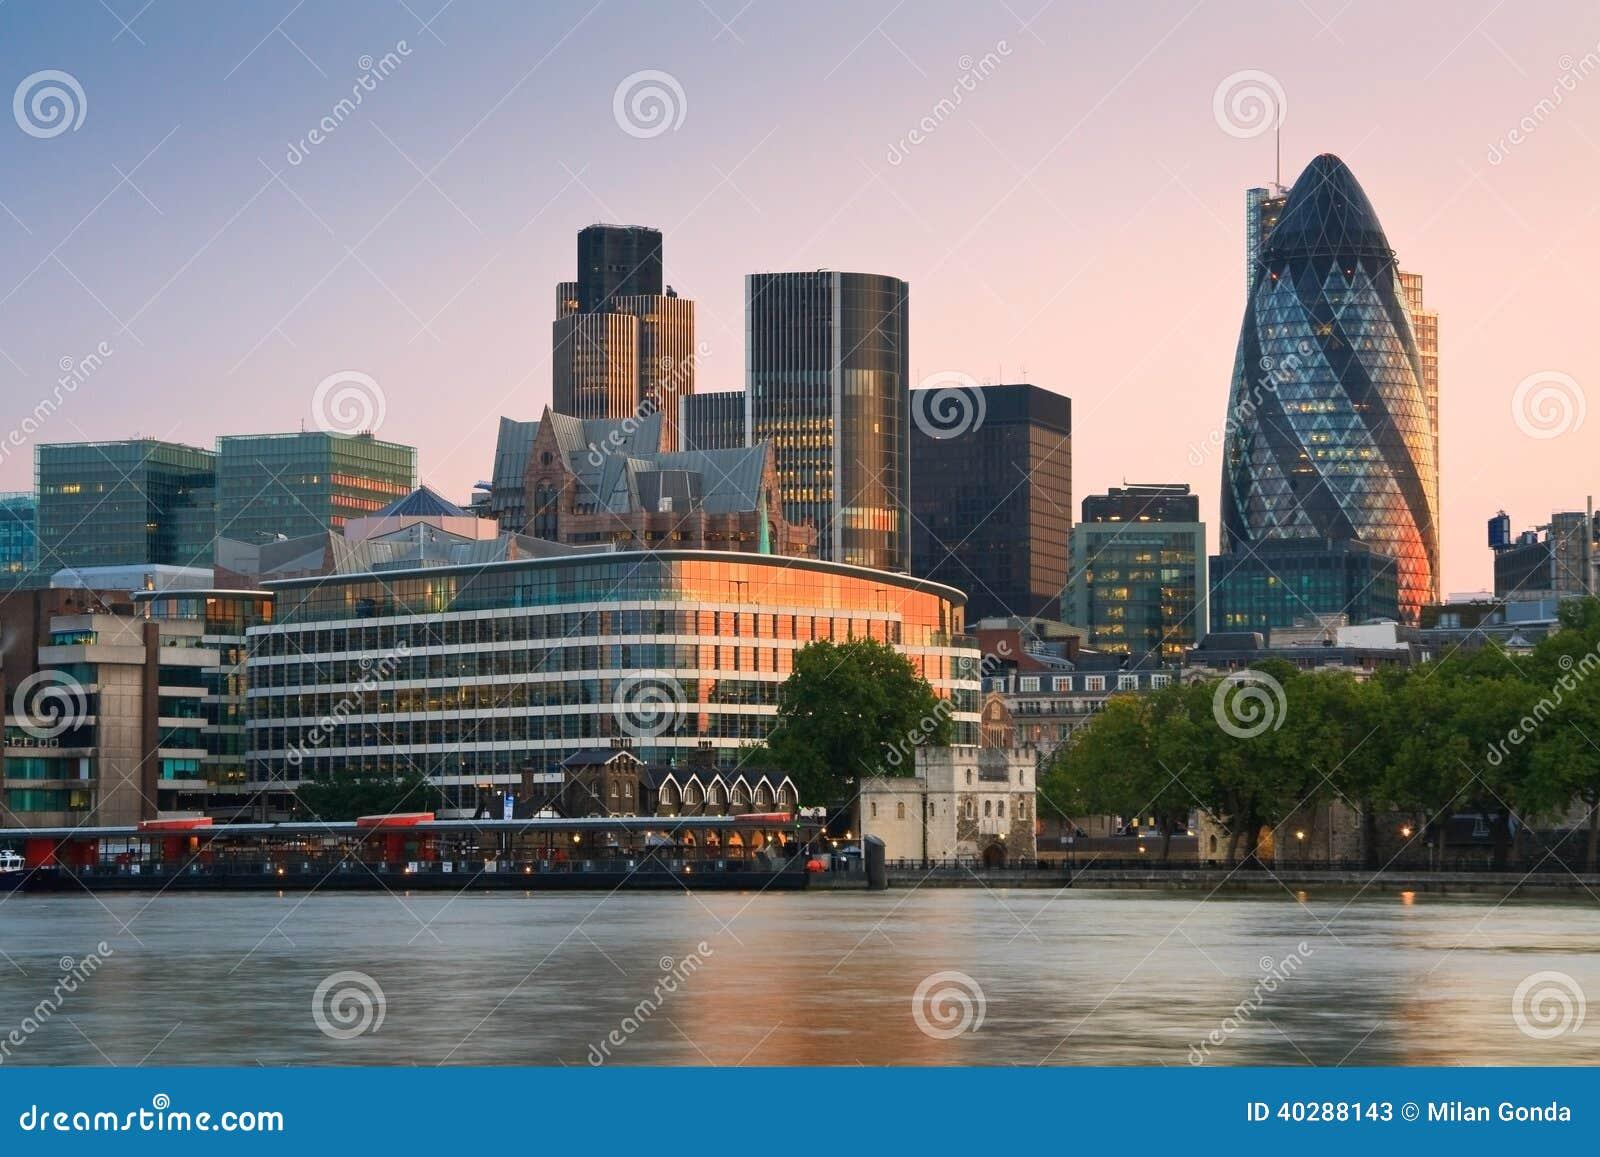 Great Britain United Kingdom Uk England London Capital City